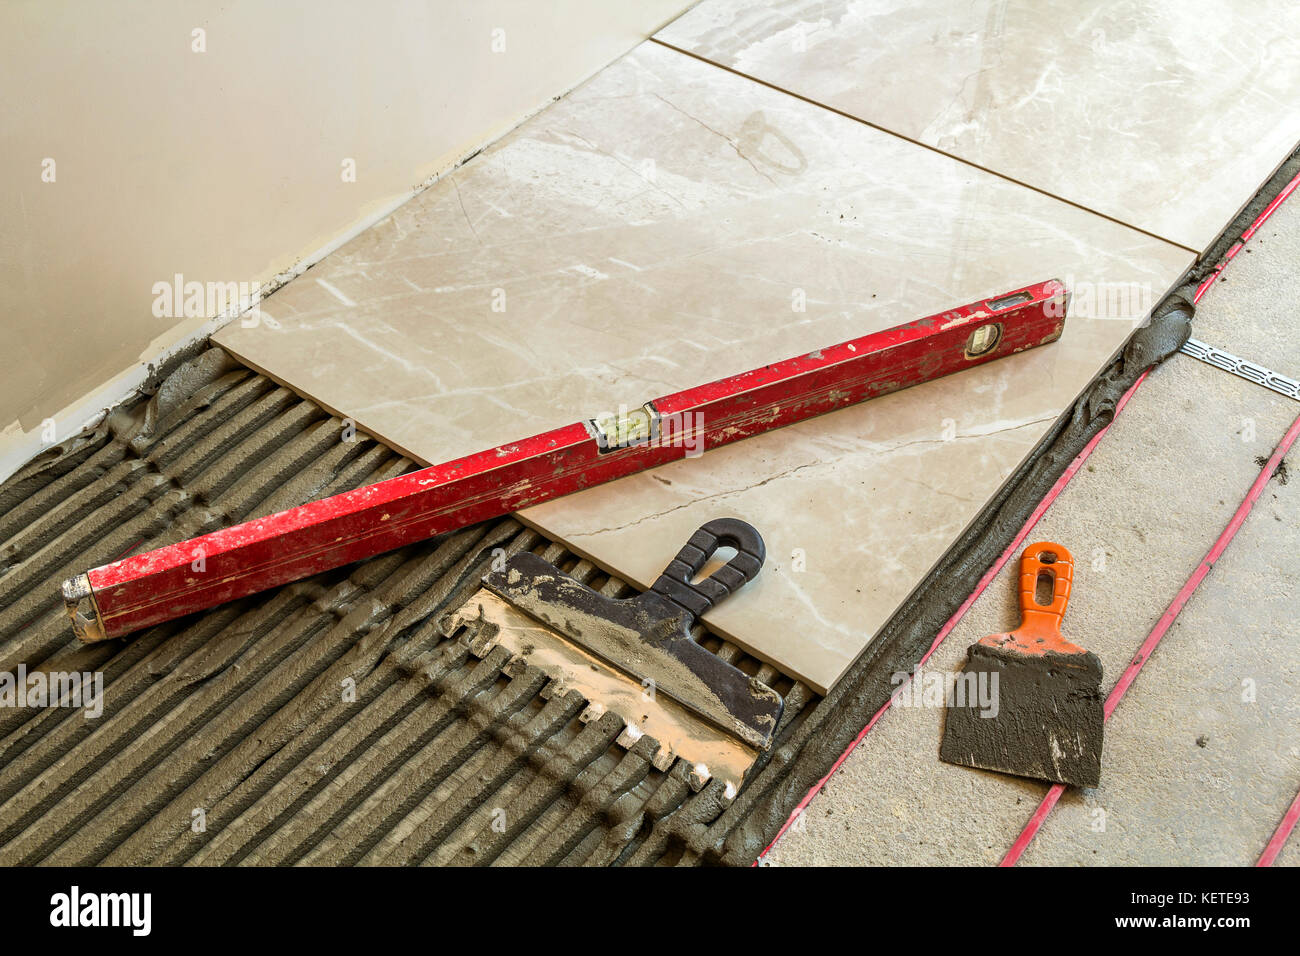 Ceramic tiles and tools for tiler floor tiles installation home ceramic tiles and tools for tiler floor tiles installation home improvement renovation ceramic tile floor adhesive mortar level dailygadgetfo Images